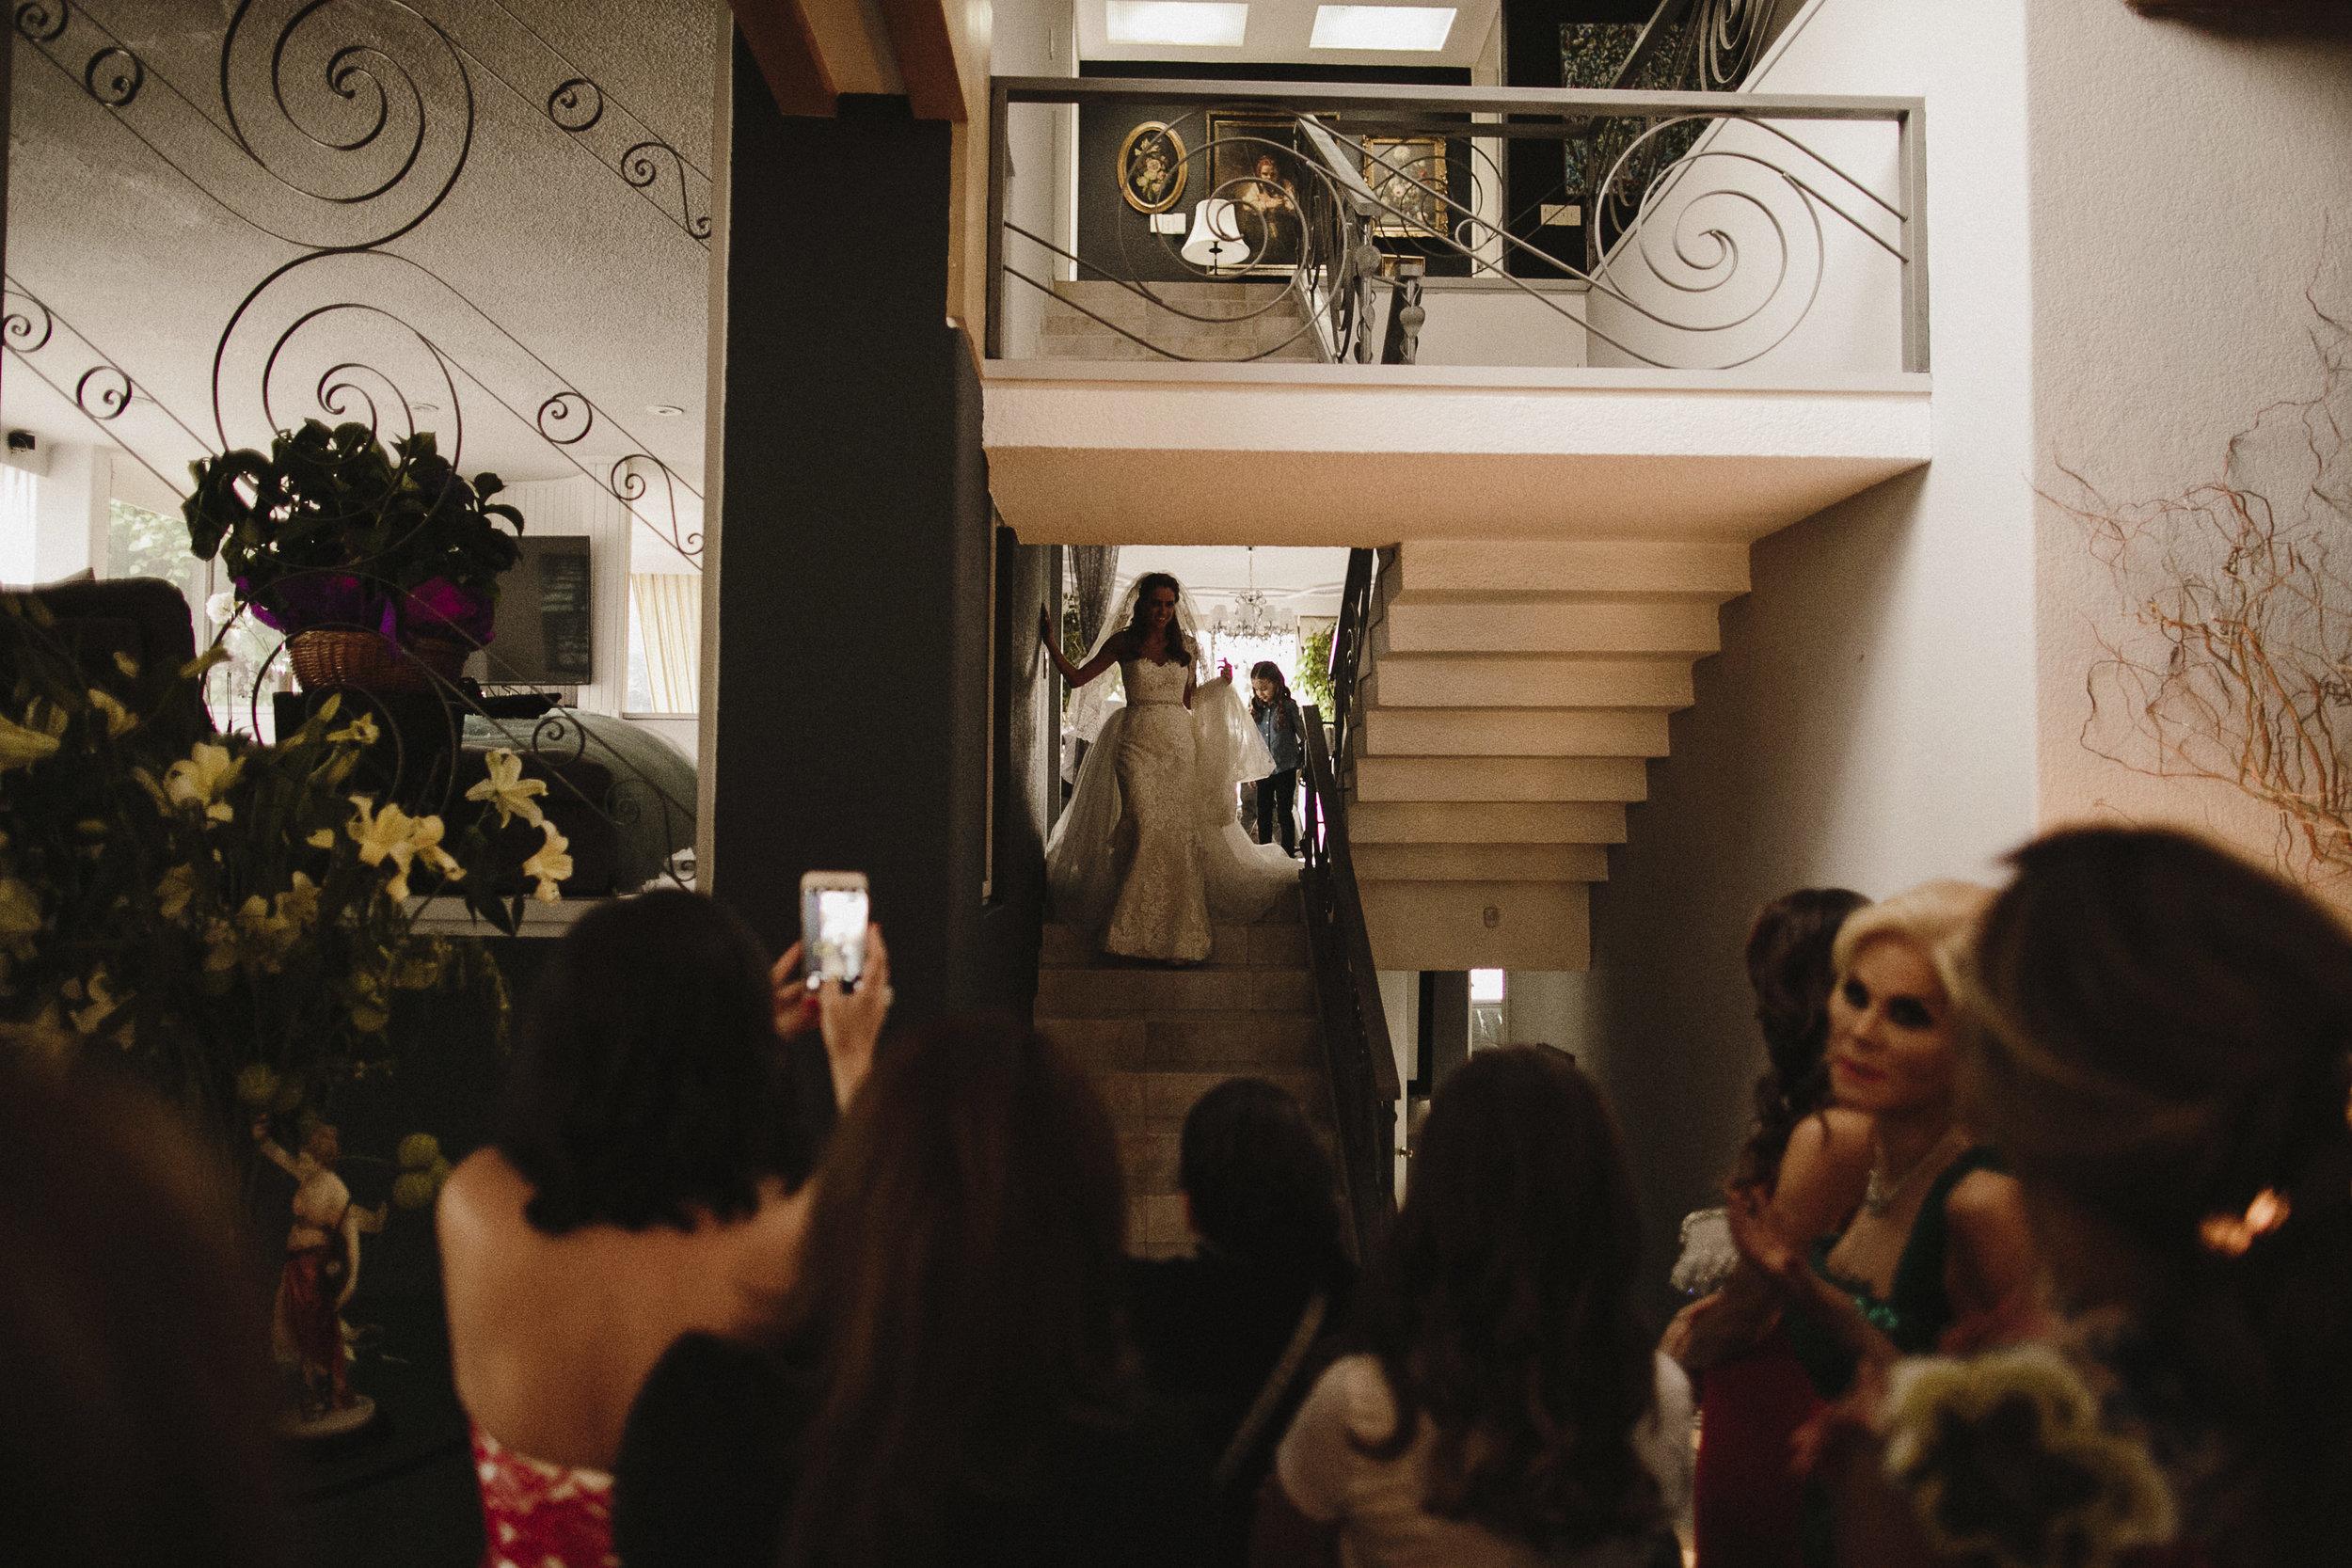 alfonso_flores_destination_wedding_photogrpahy_paola_alonso-129.JPG